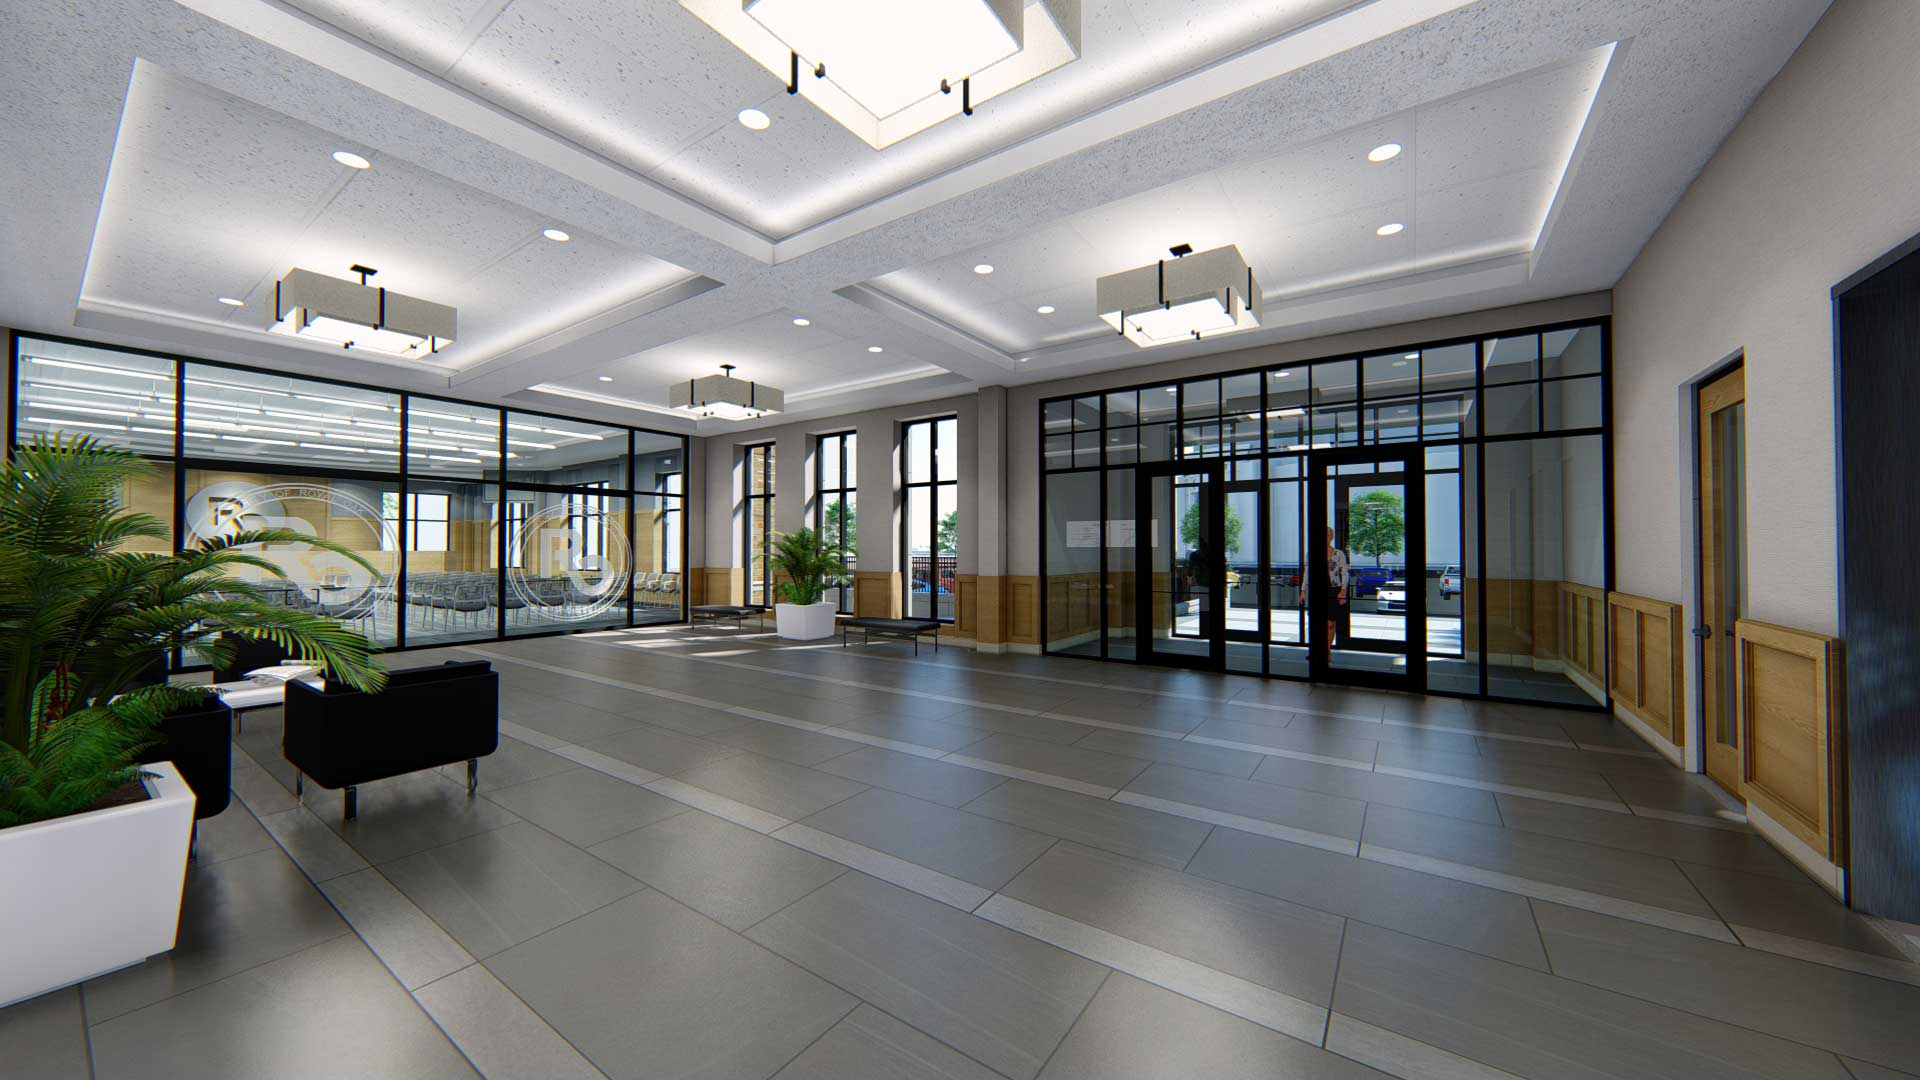 Royal Oak City Hall lobby interior rendering